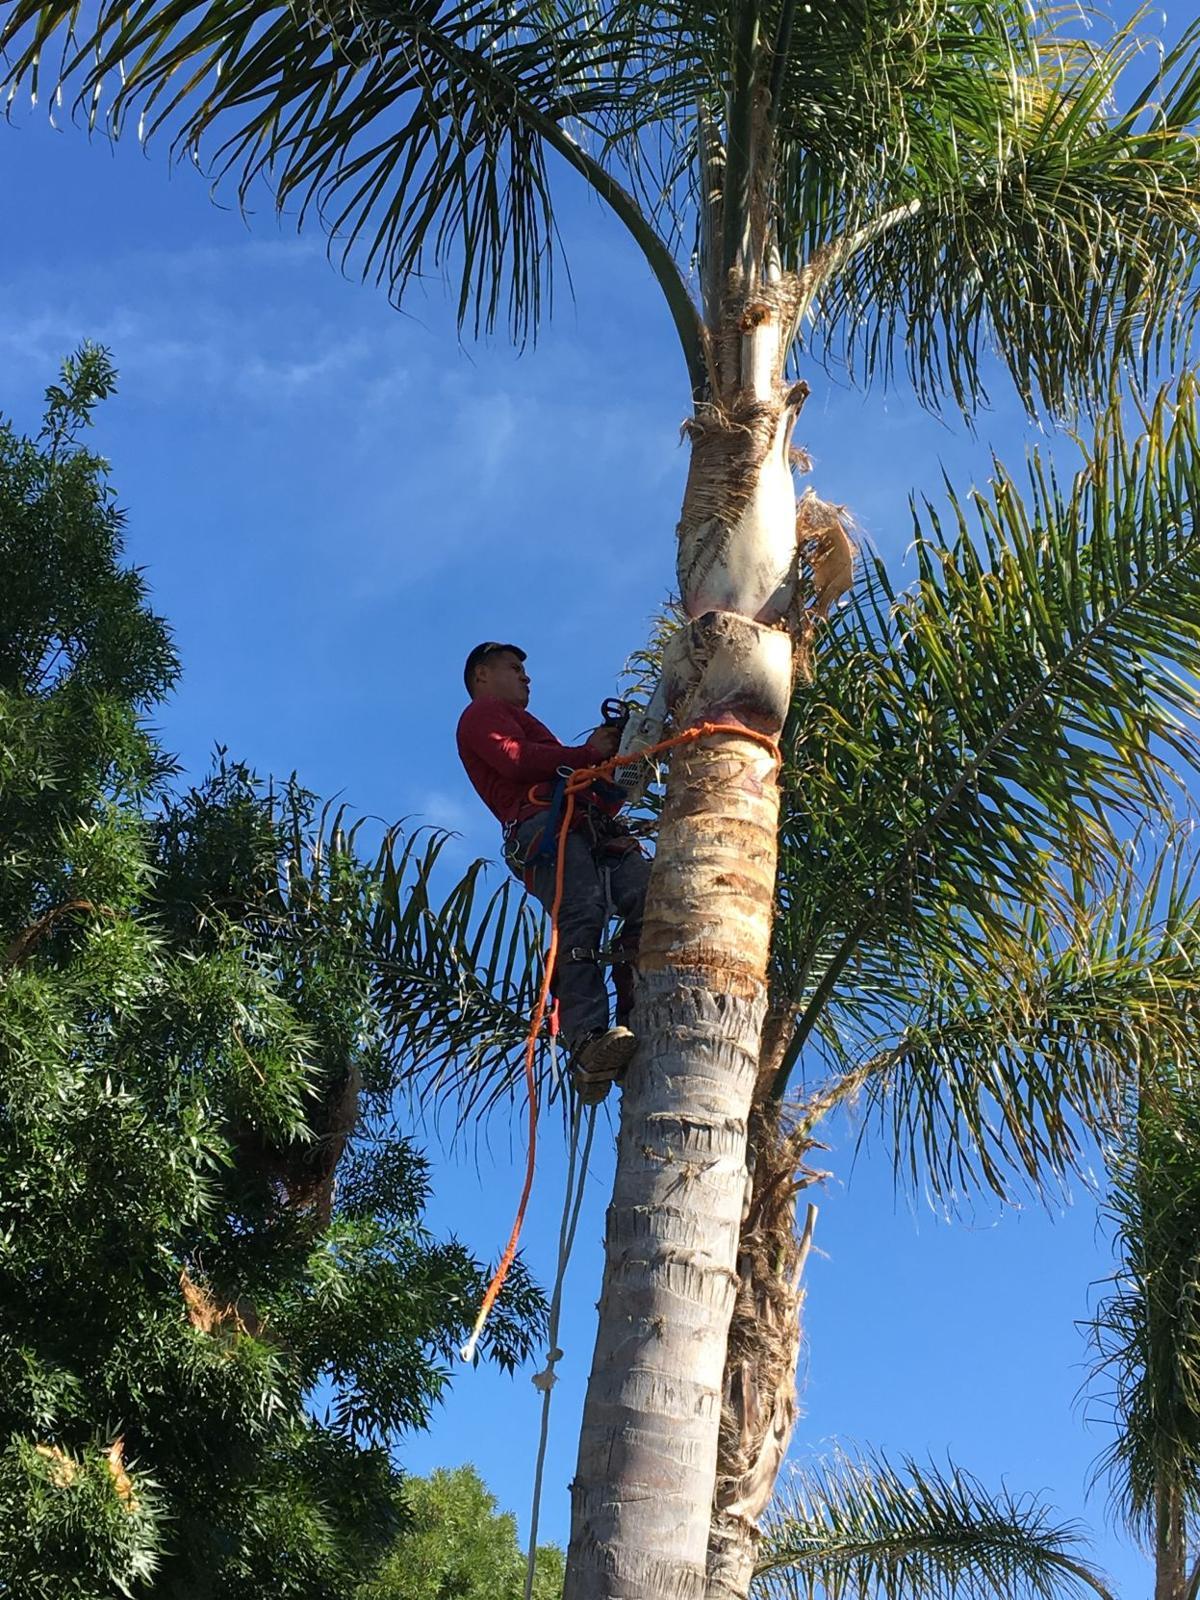 Pic 6 John's Tree Service - Palm Tree Trimming